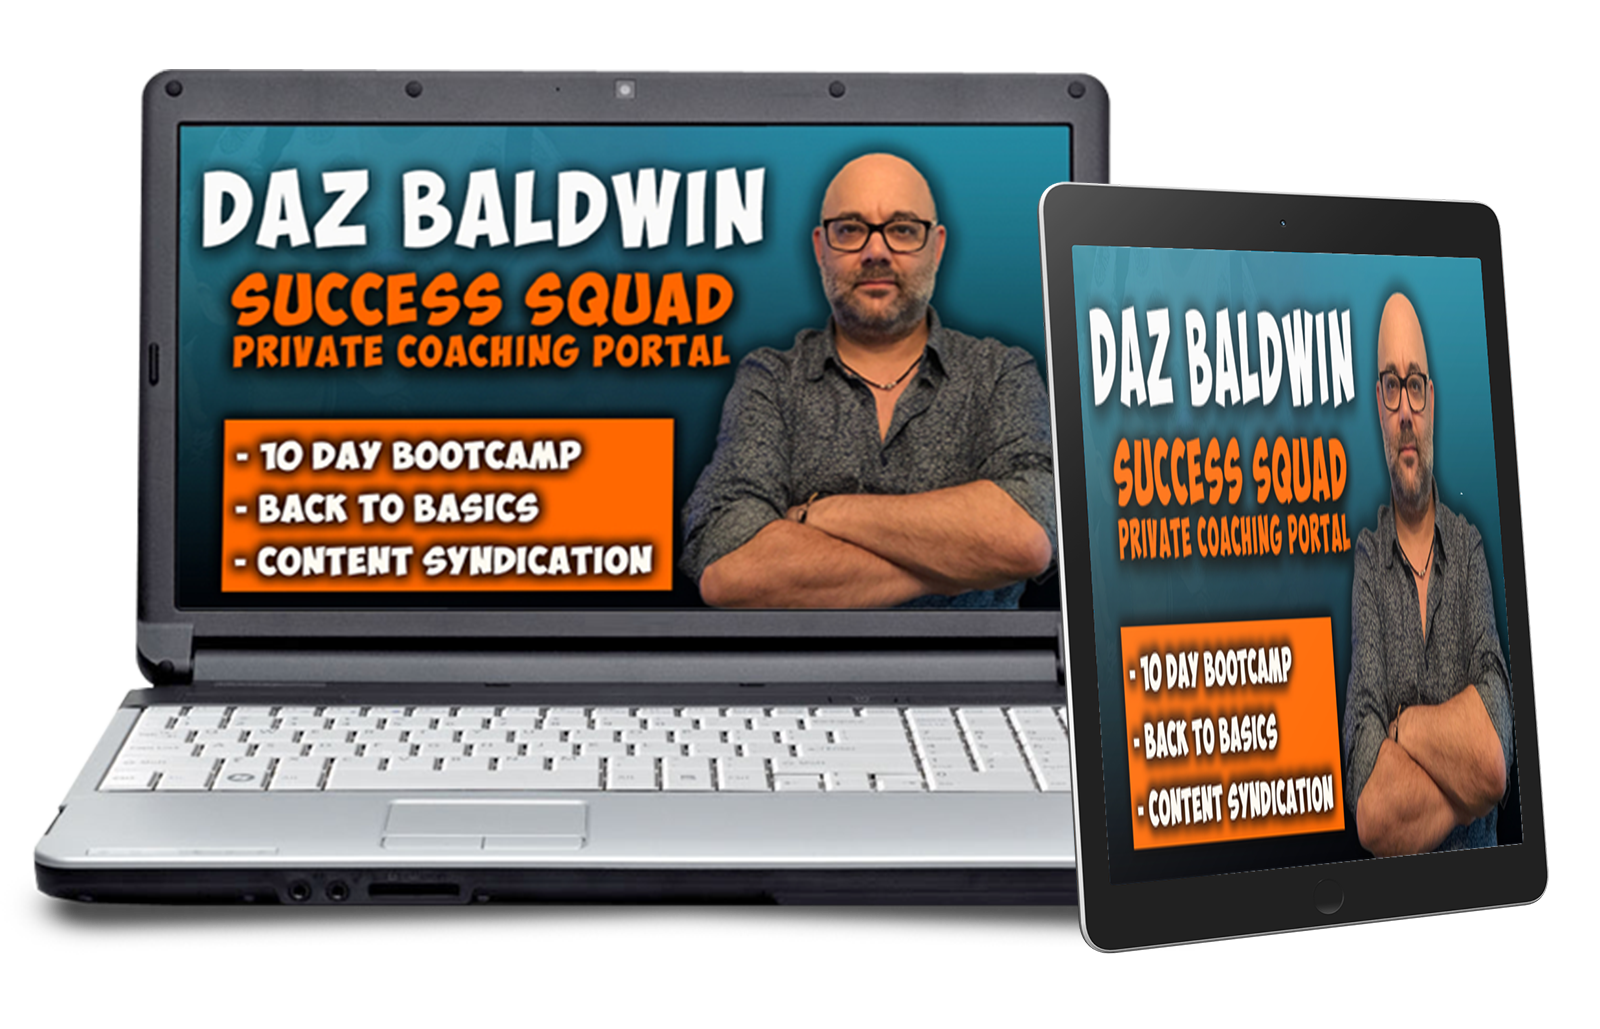 Success Squad Private Coaching Portal